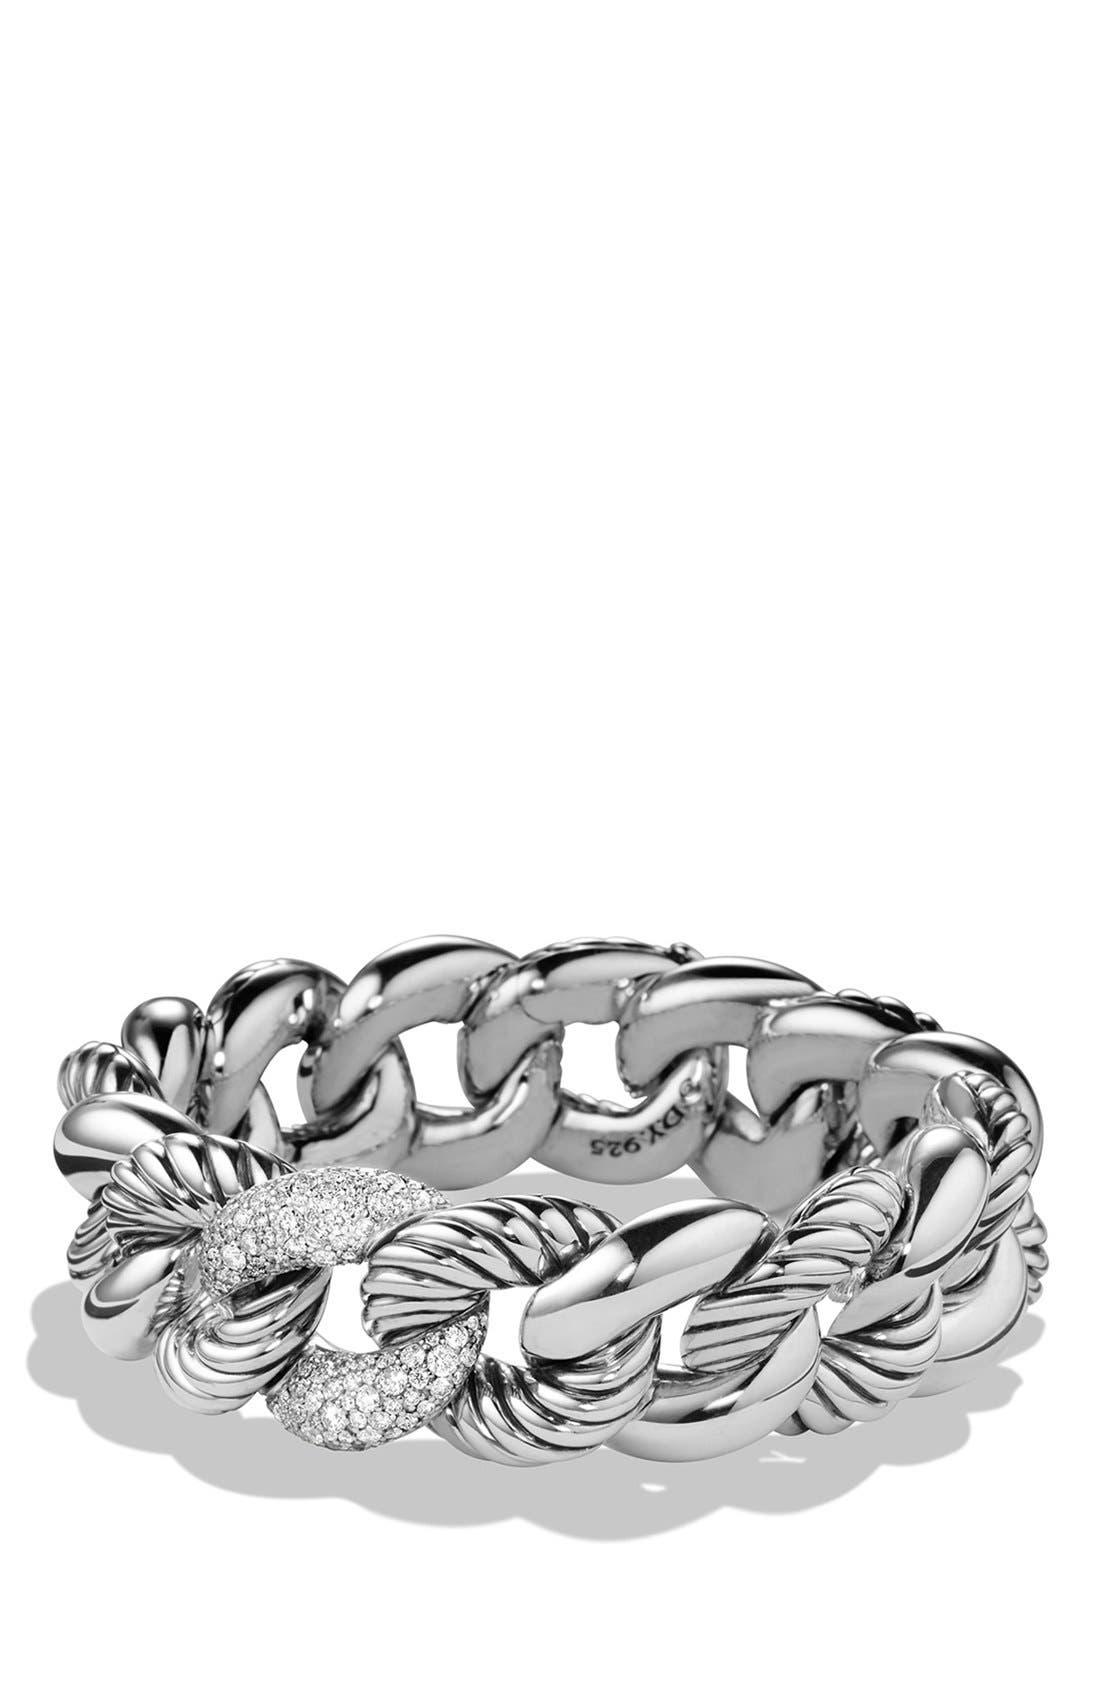 Alternate Image 1 Selected - David Yurman'Belmont' Curb Link Bracelet with Diamonds